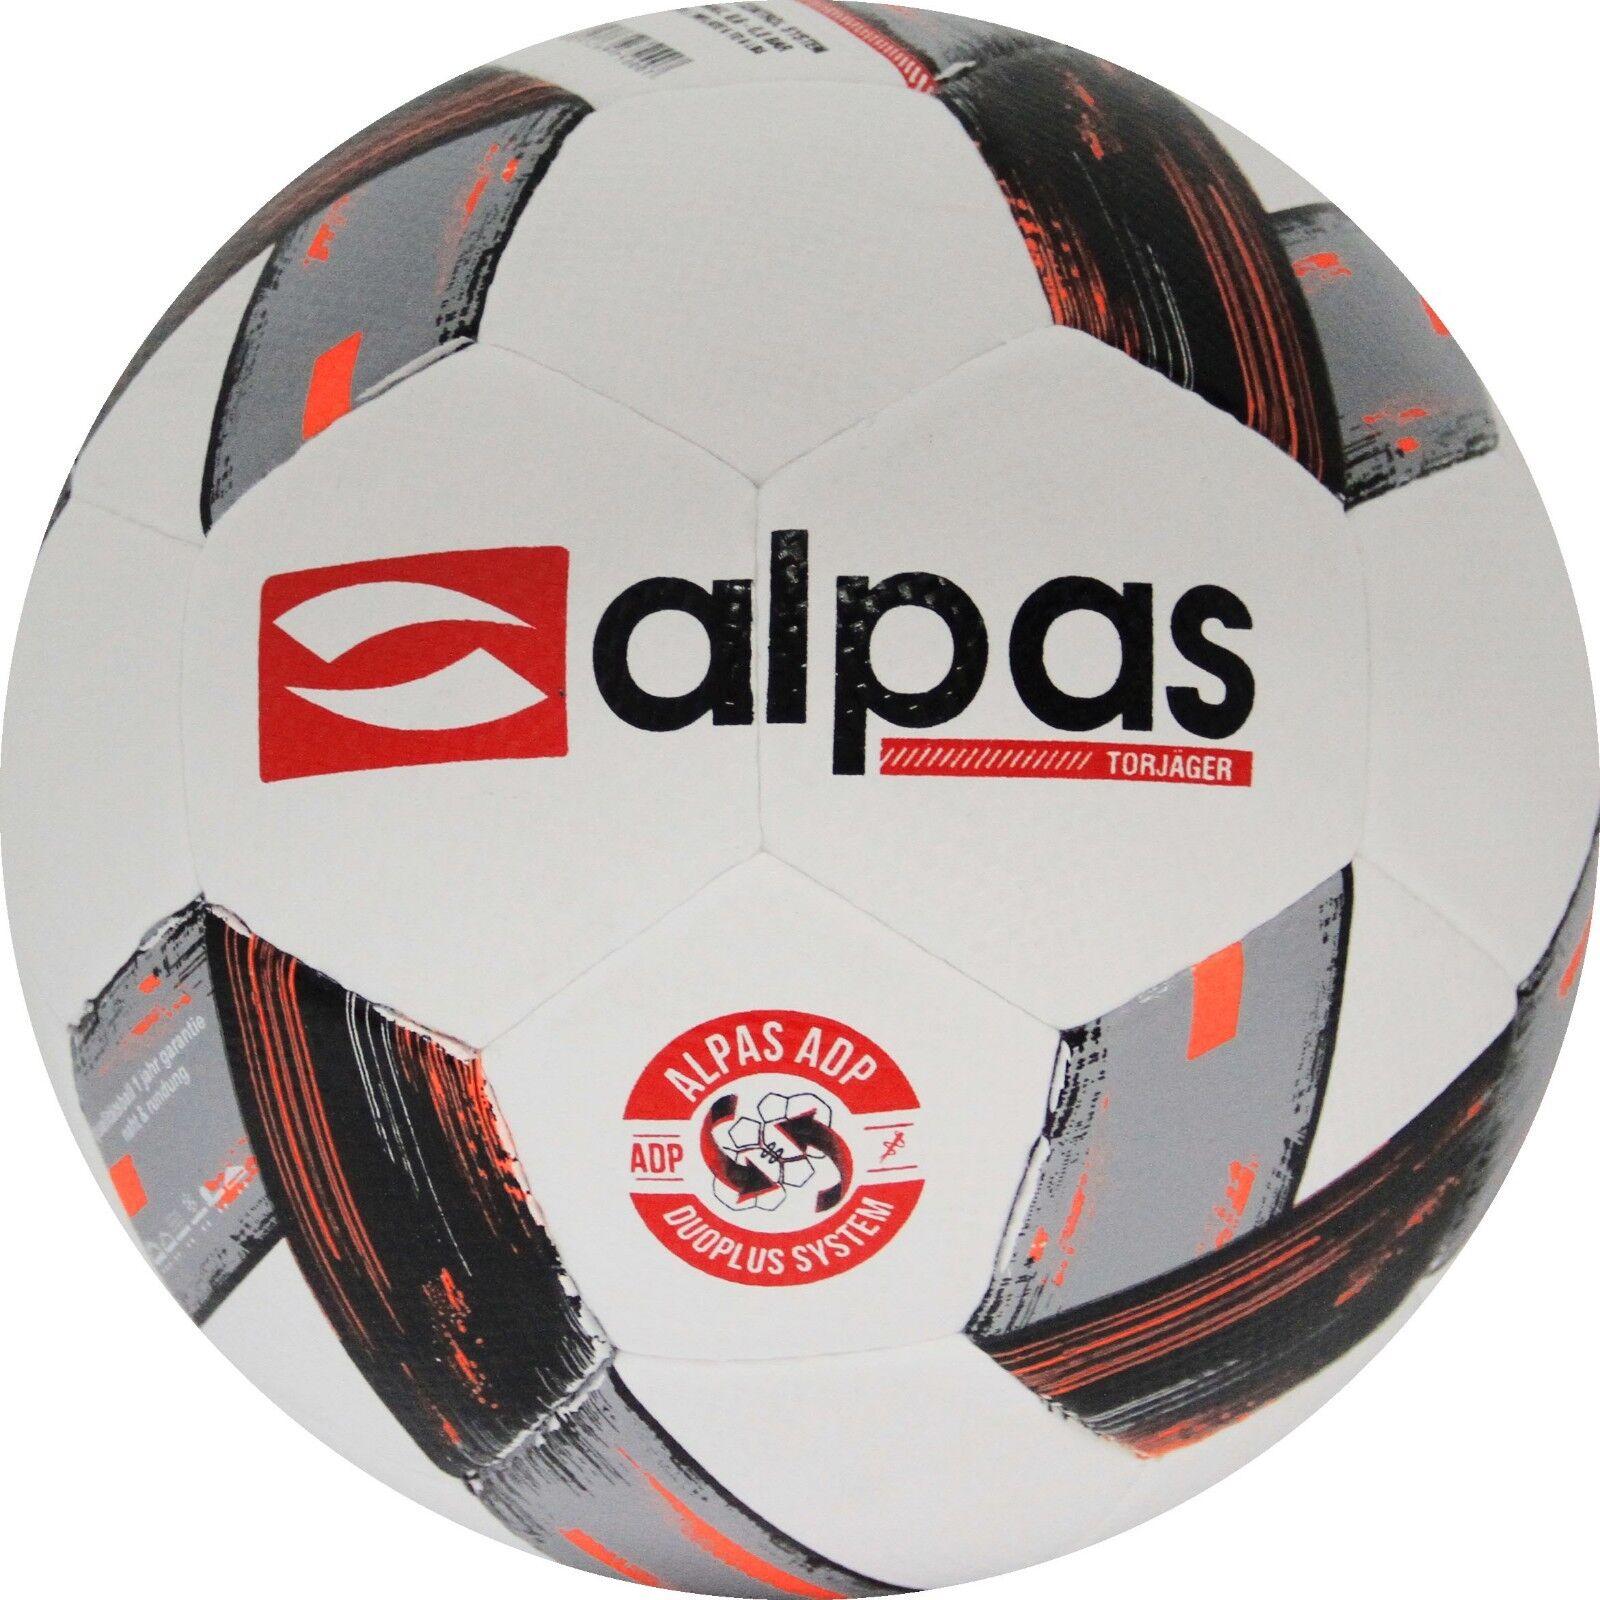 15 X Alpas Fútbol Goleador Formación Competencia Tamaño 4 Balón de Entrenamiento